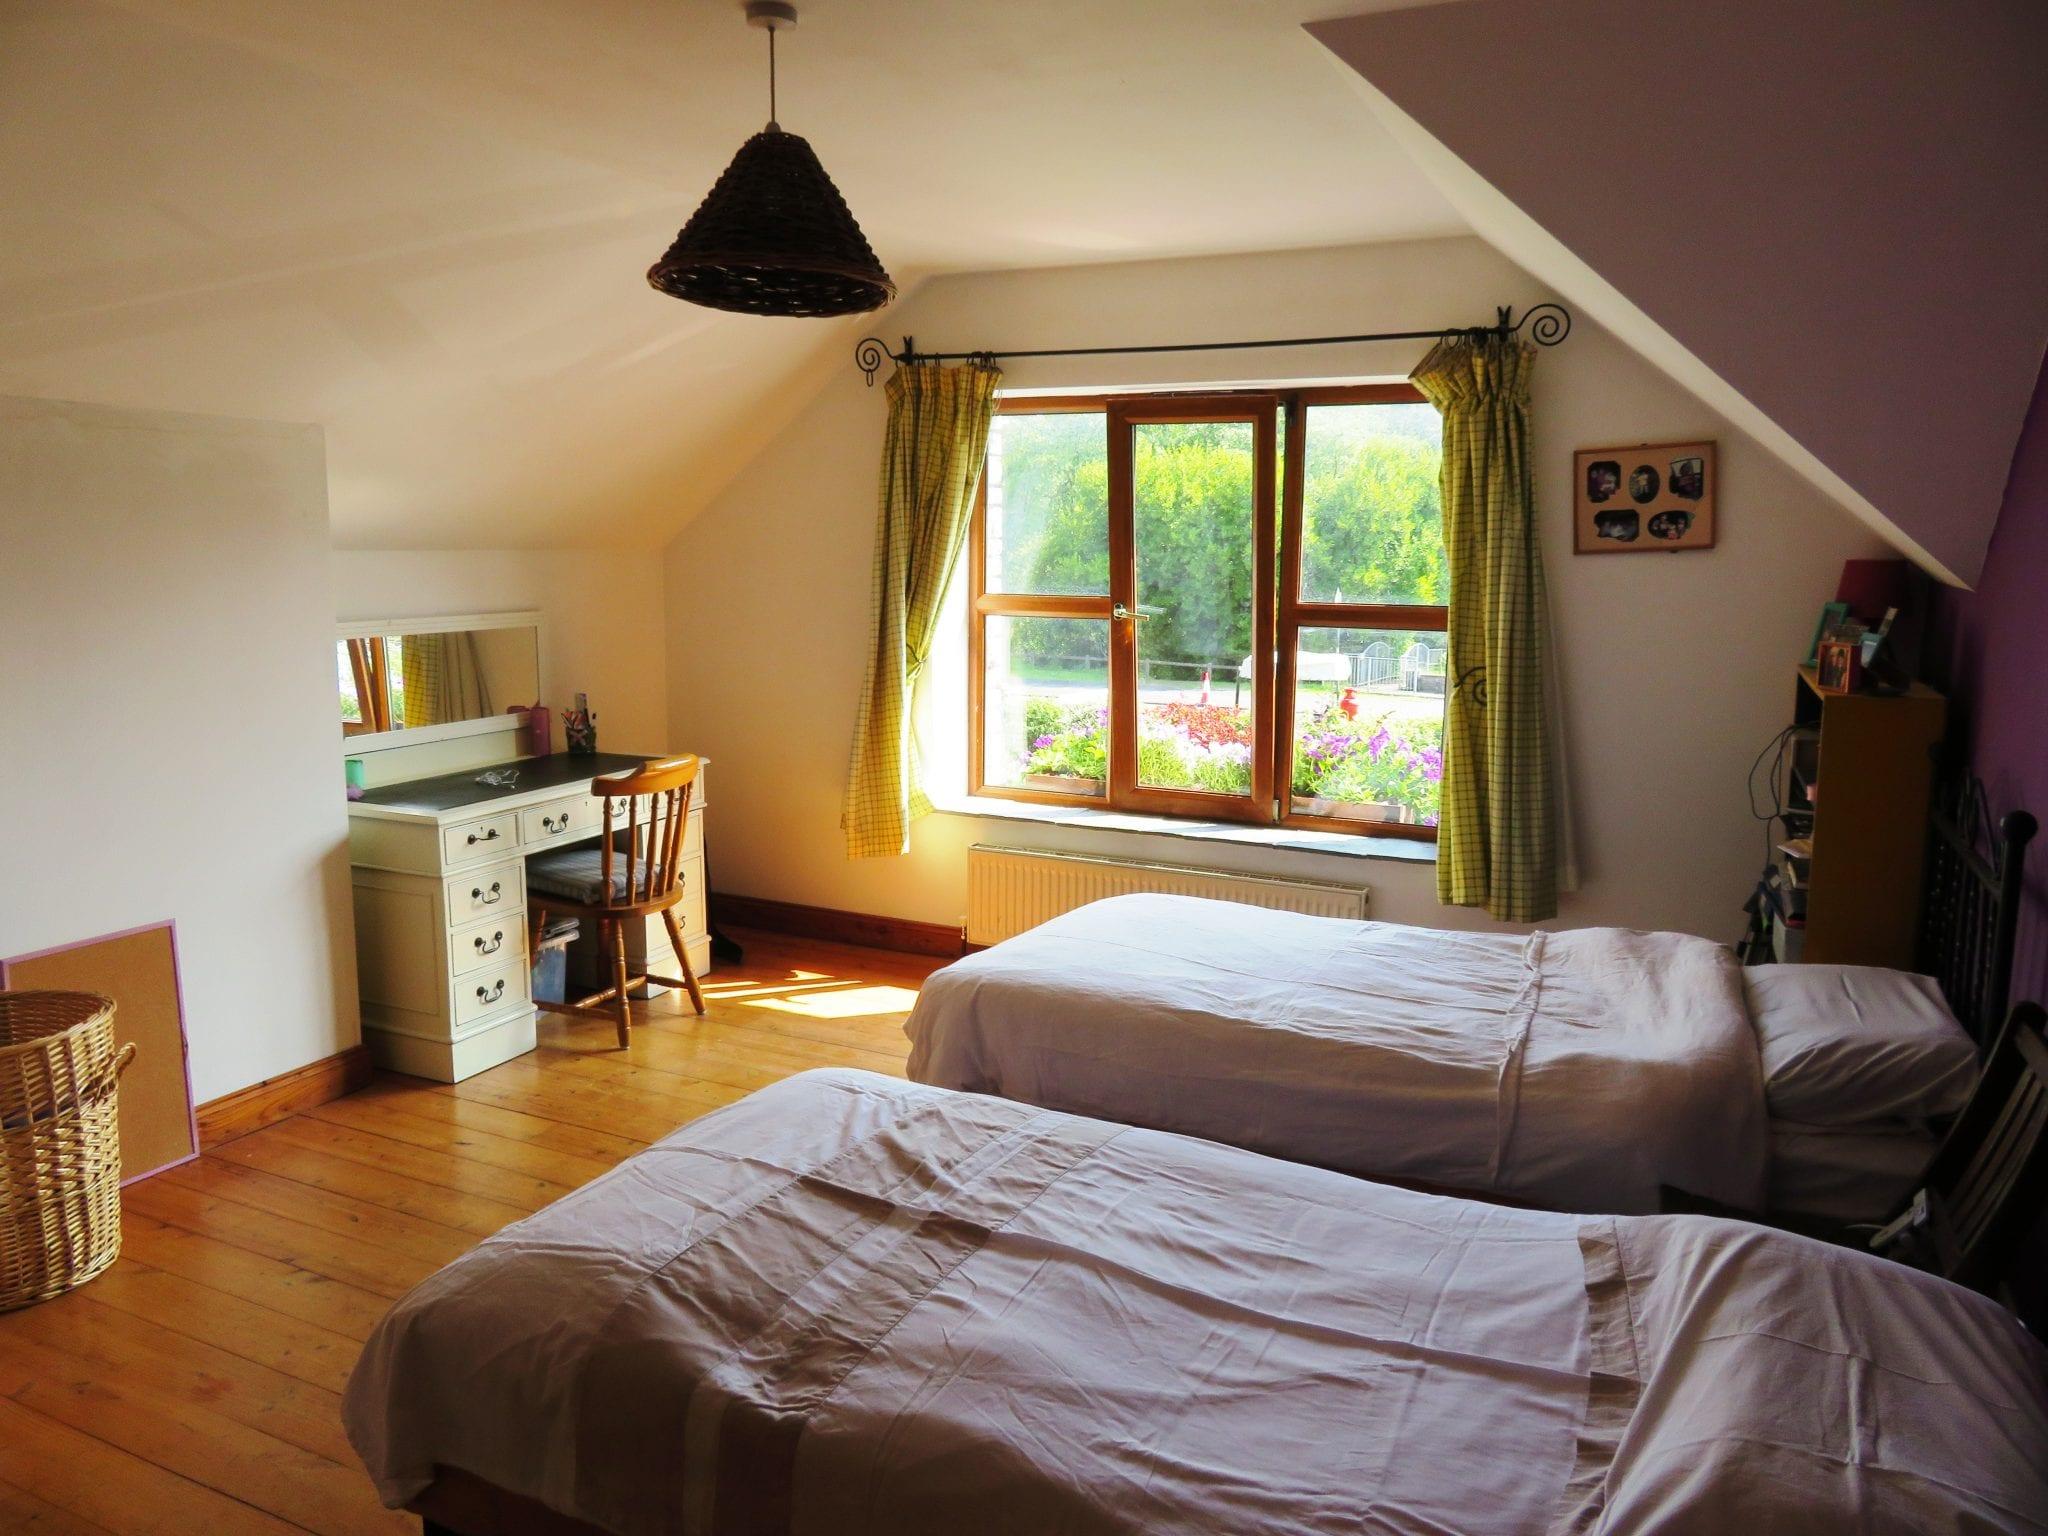 IMG_0019 Bedroom 3